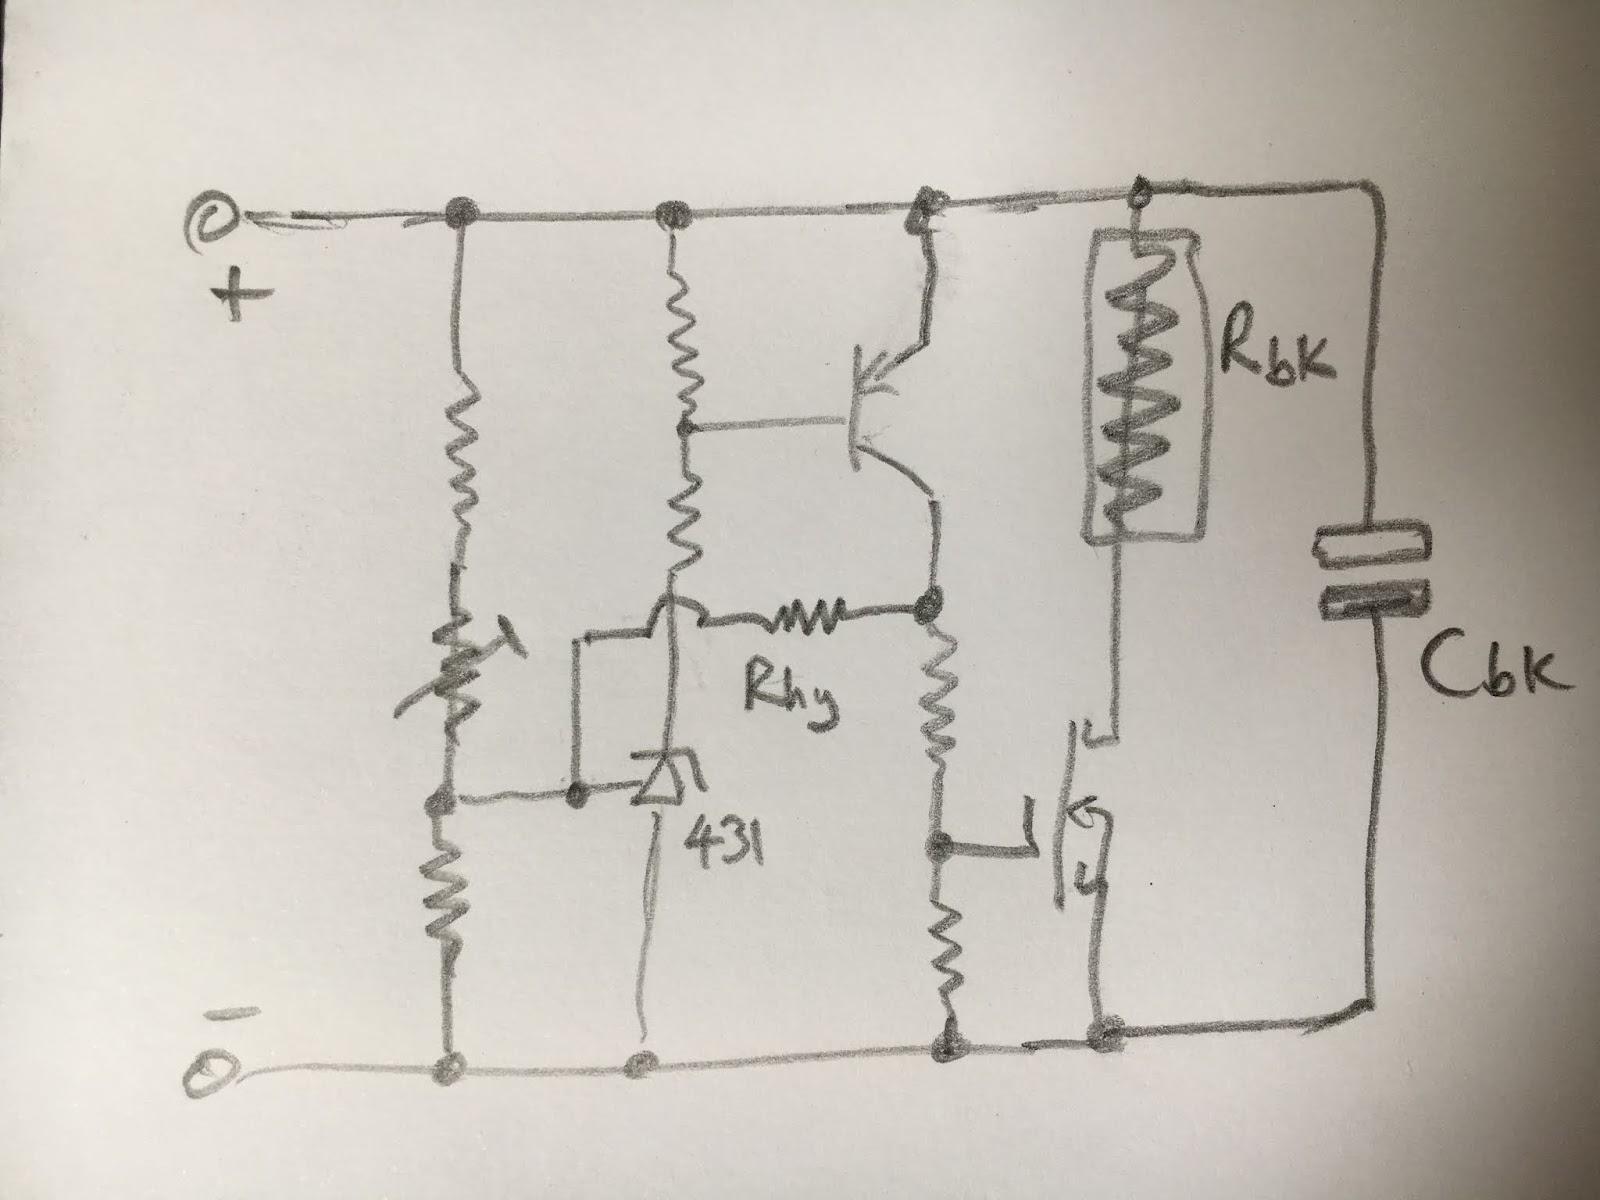 The Mighty Shiz: Active clamp / braking resistor circuit design